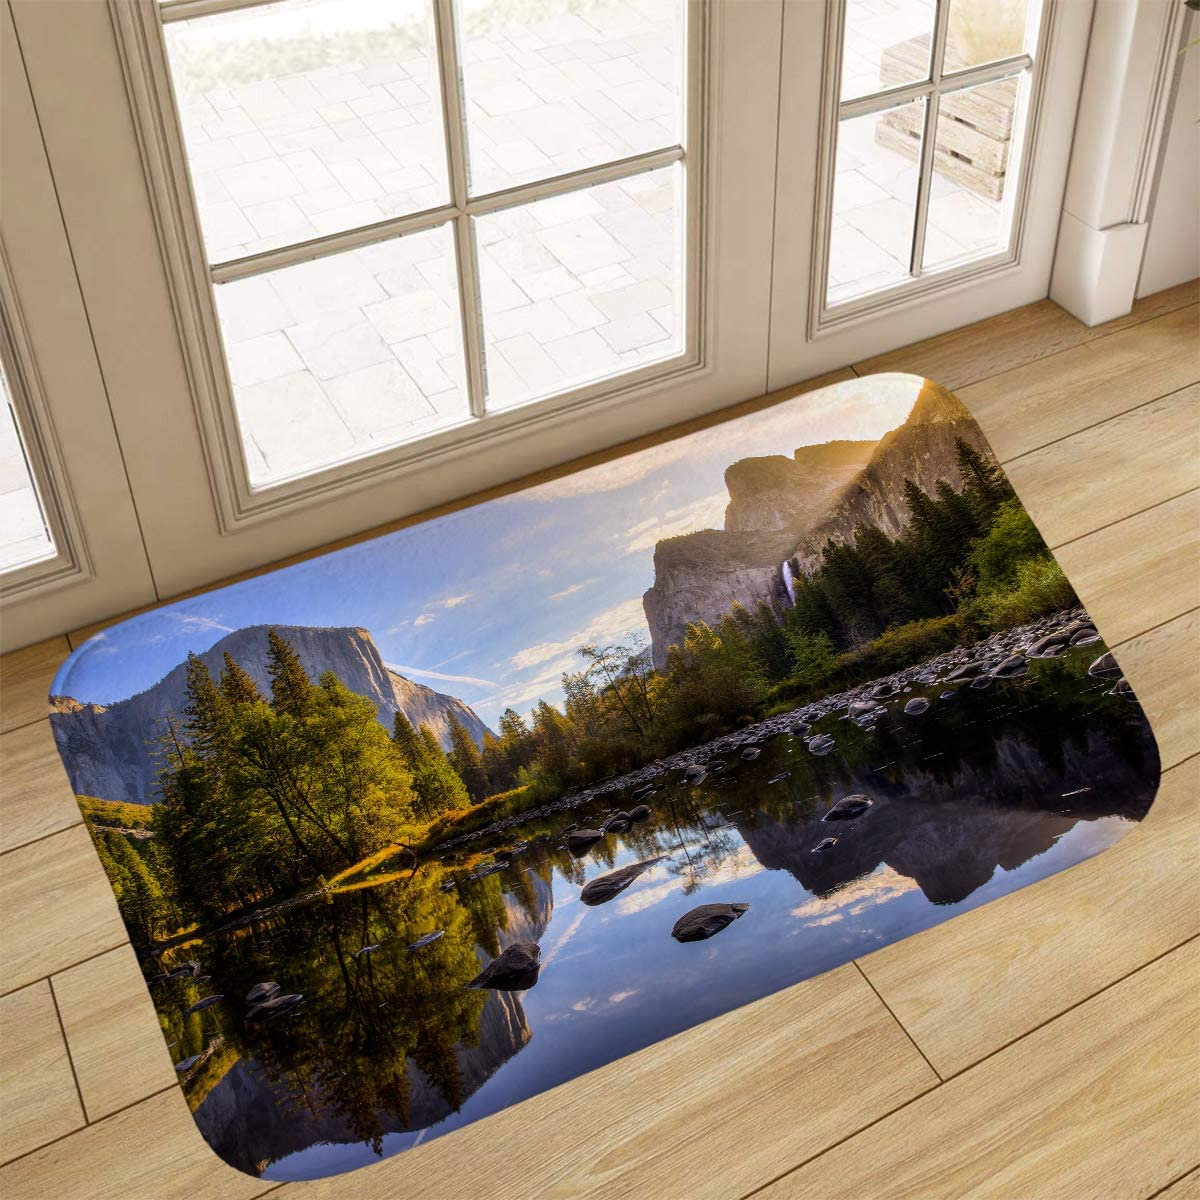 Yosemite Bathroom Rugs, Doormat,Sunrise On Yosemite Valley Yosemite National Park,Home Decor Floor Carpet Bath Mat,16x24 in